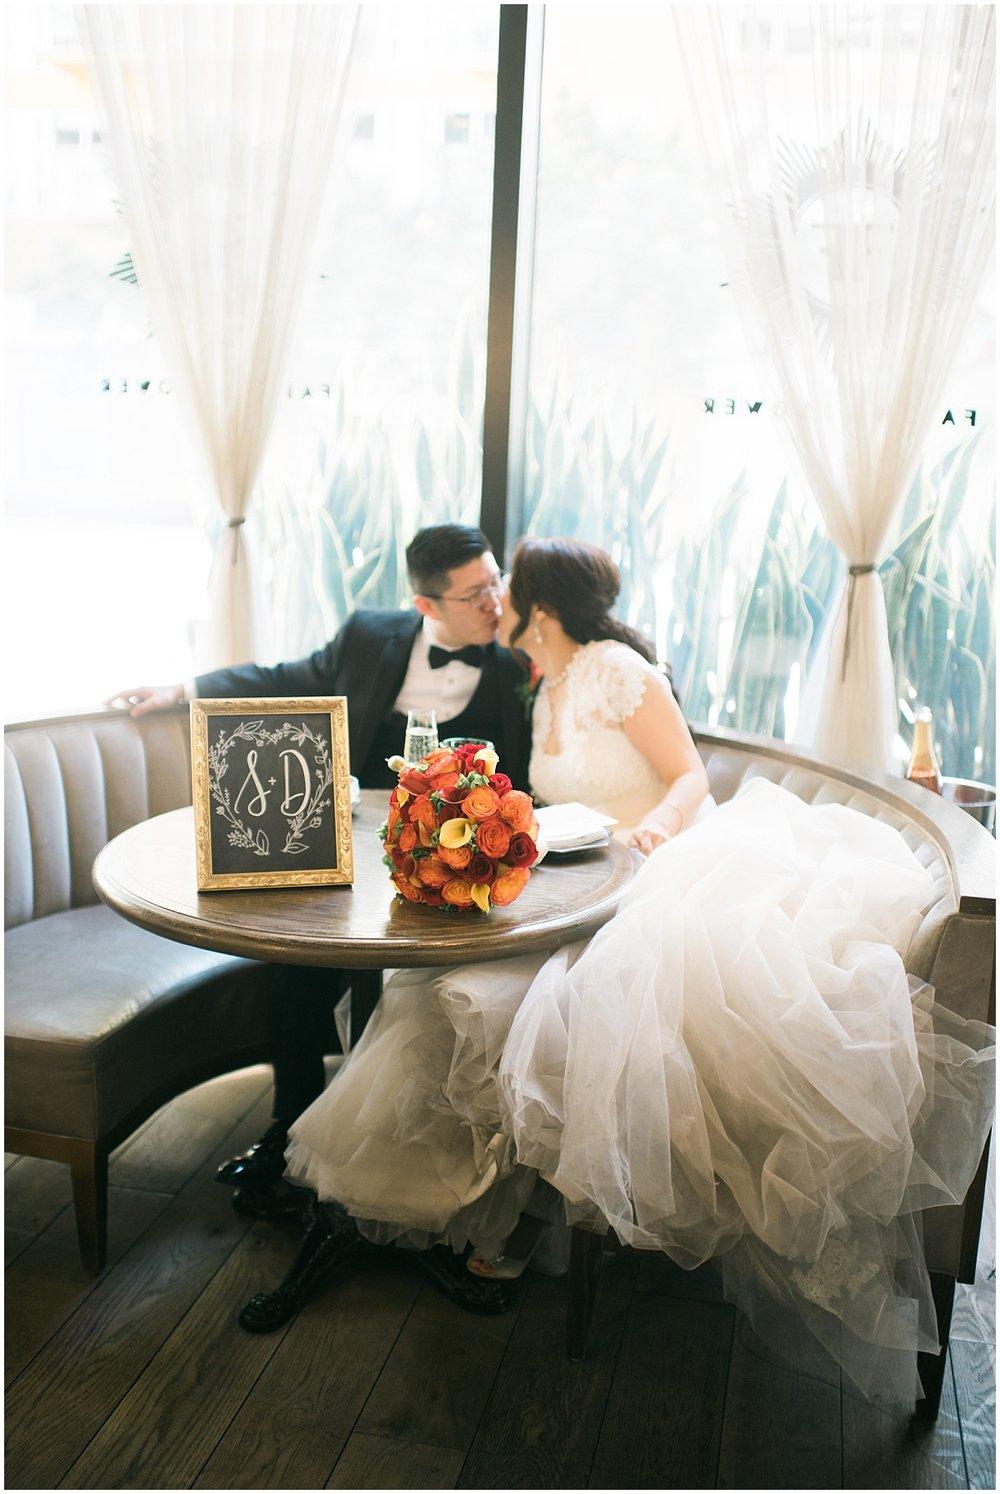 Faith-and-Flower-Wedding-Soo-Dan-Carissa-Woo-Photography_0044.jpg